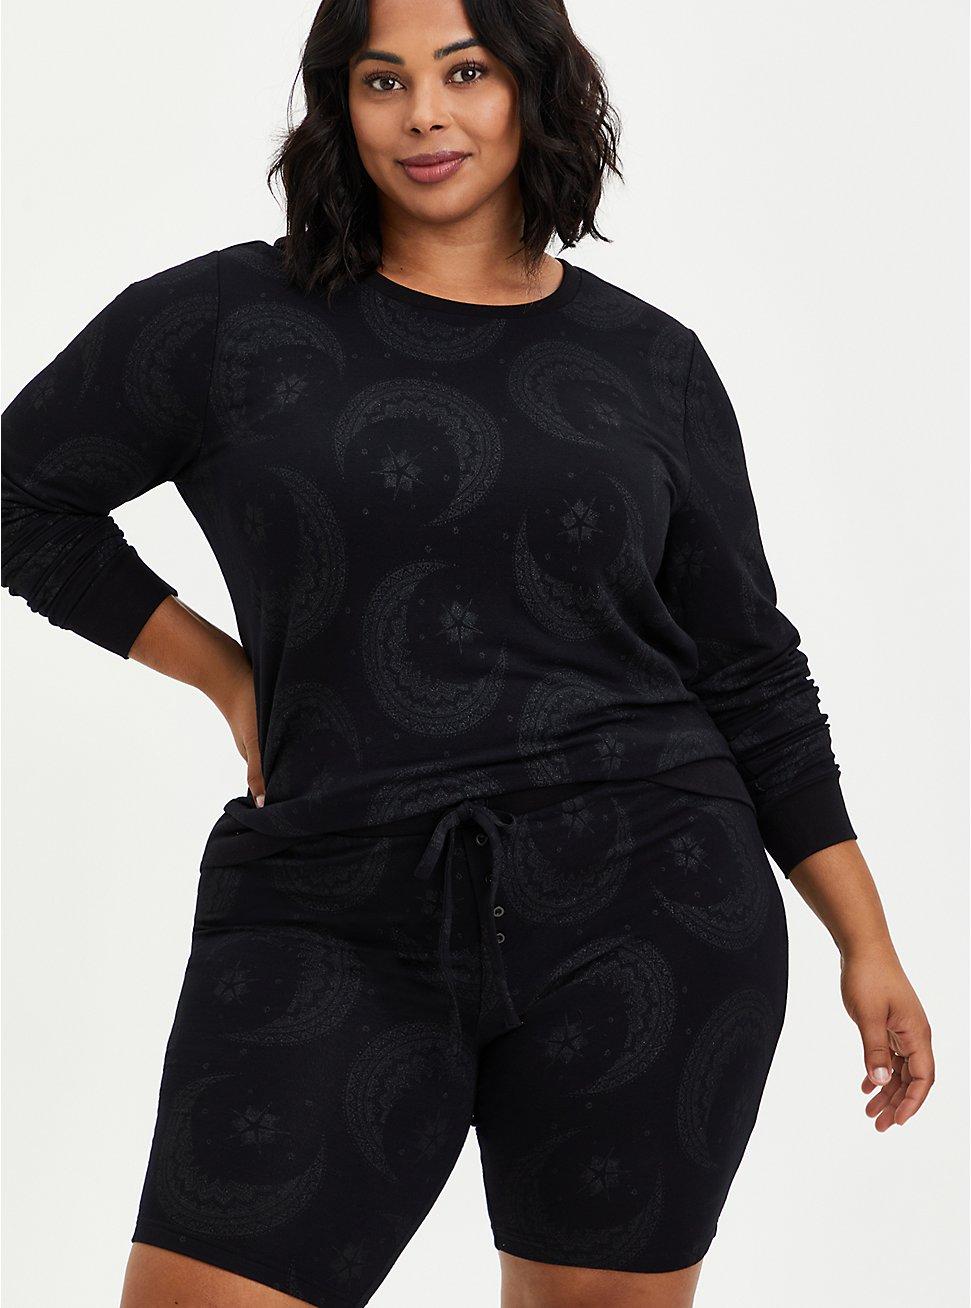 Sleep Sweatshirt - Micro Modal Terry Moon Black, MULTI, hi-res